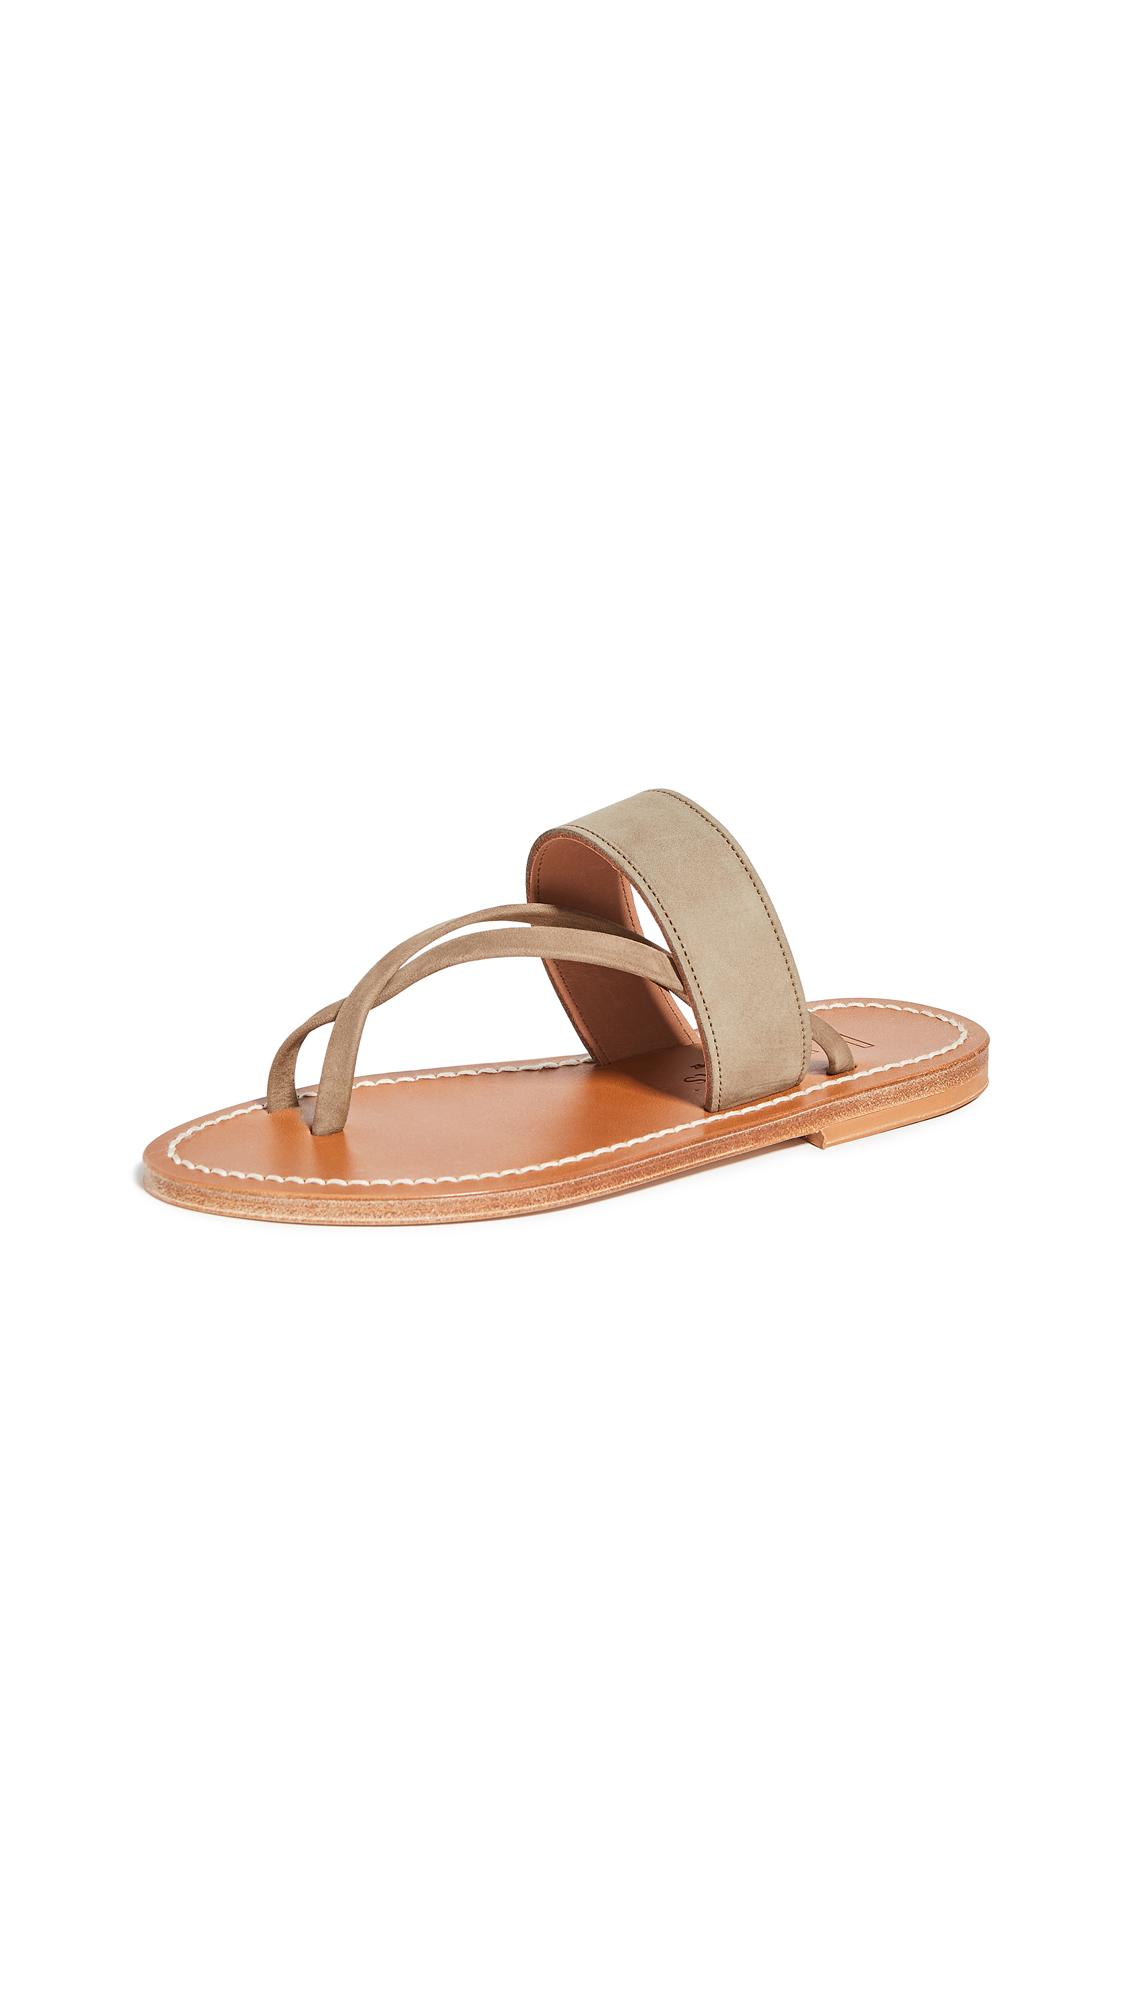 Buy K. Jacques Nehru Sandals online, shop K. Jacques